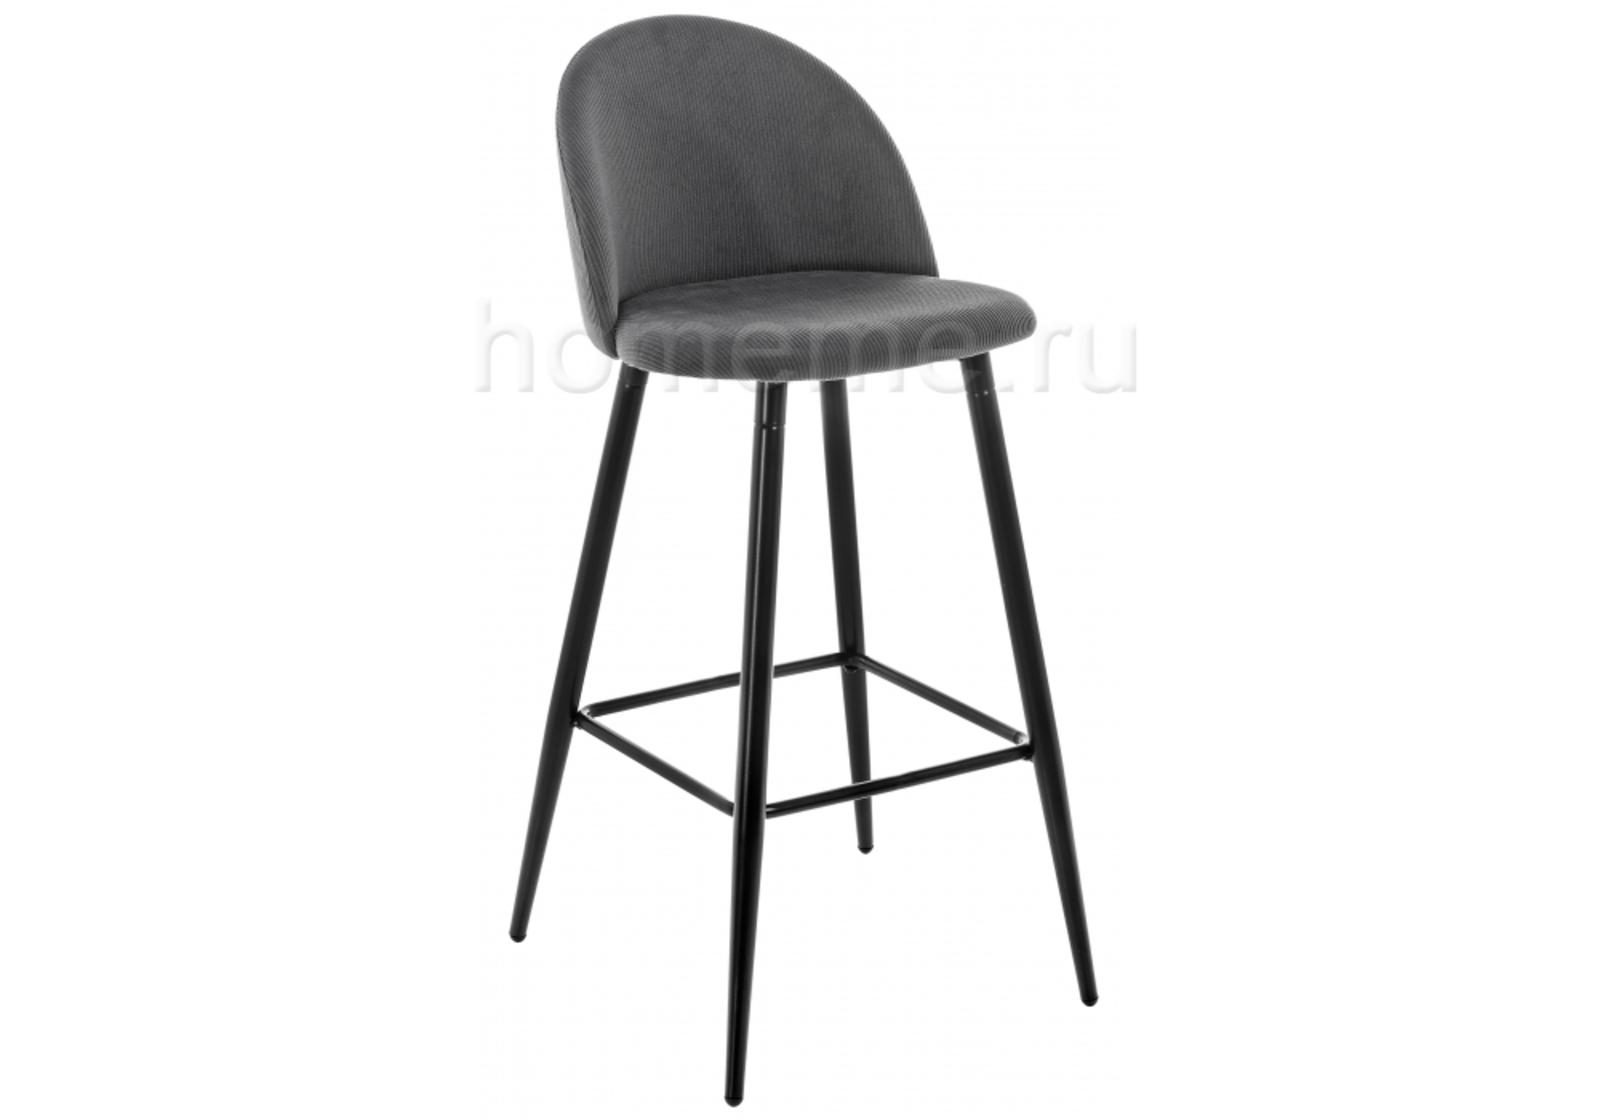 Барный стул Dodo bar серый 11532 Dodo bar серый 11532 (18291) фото